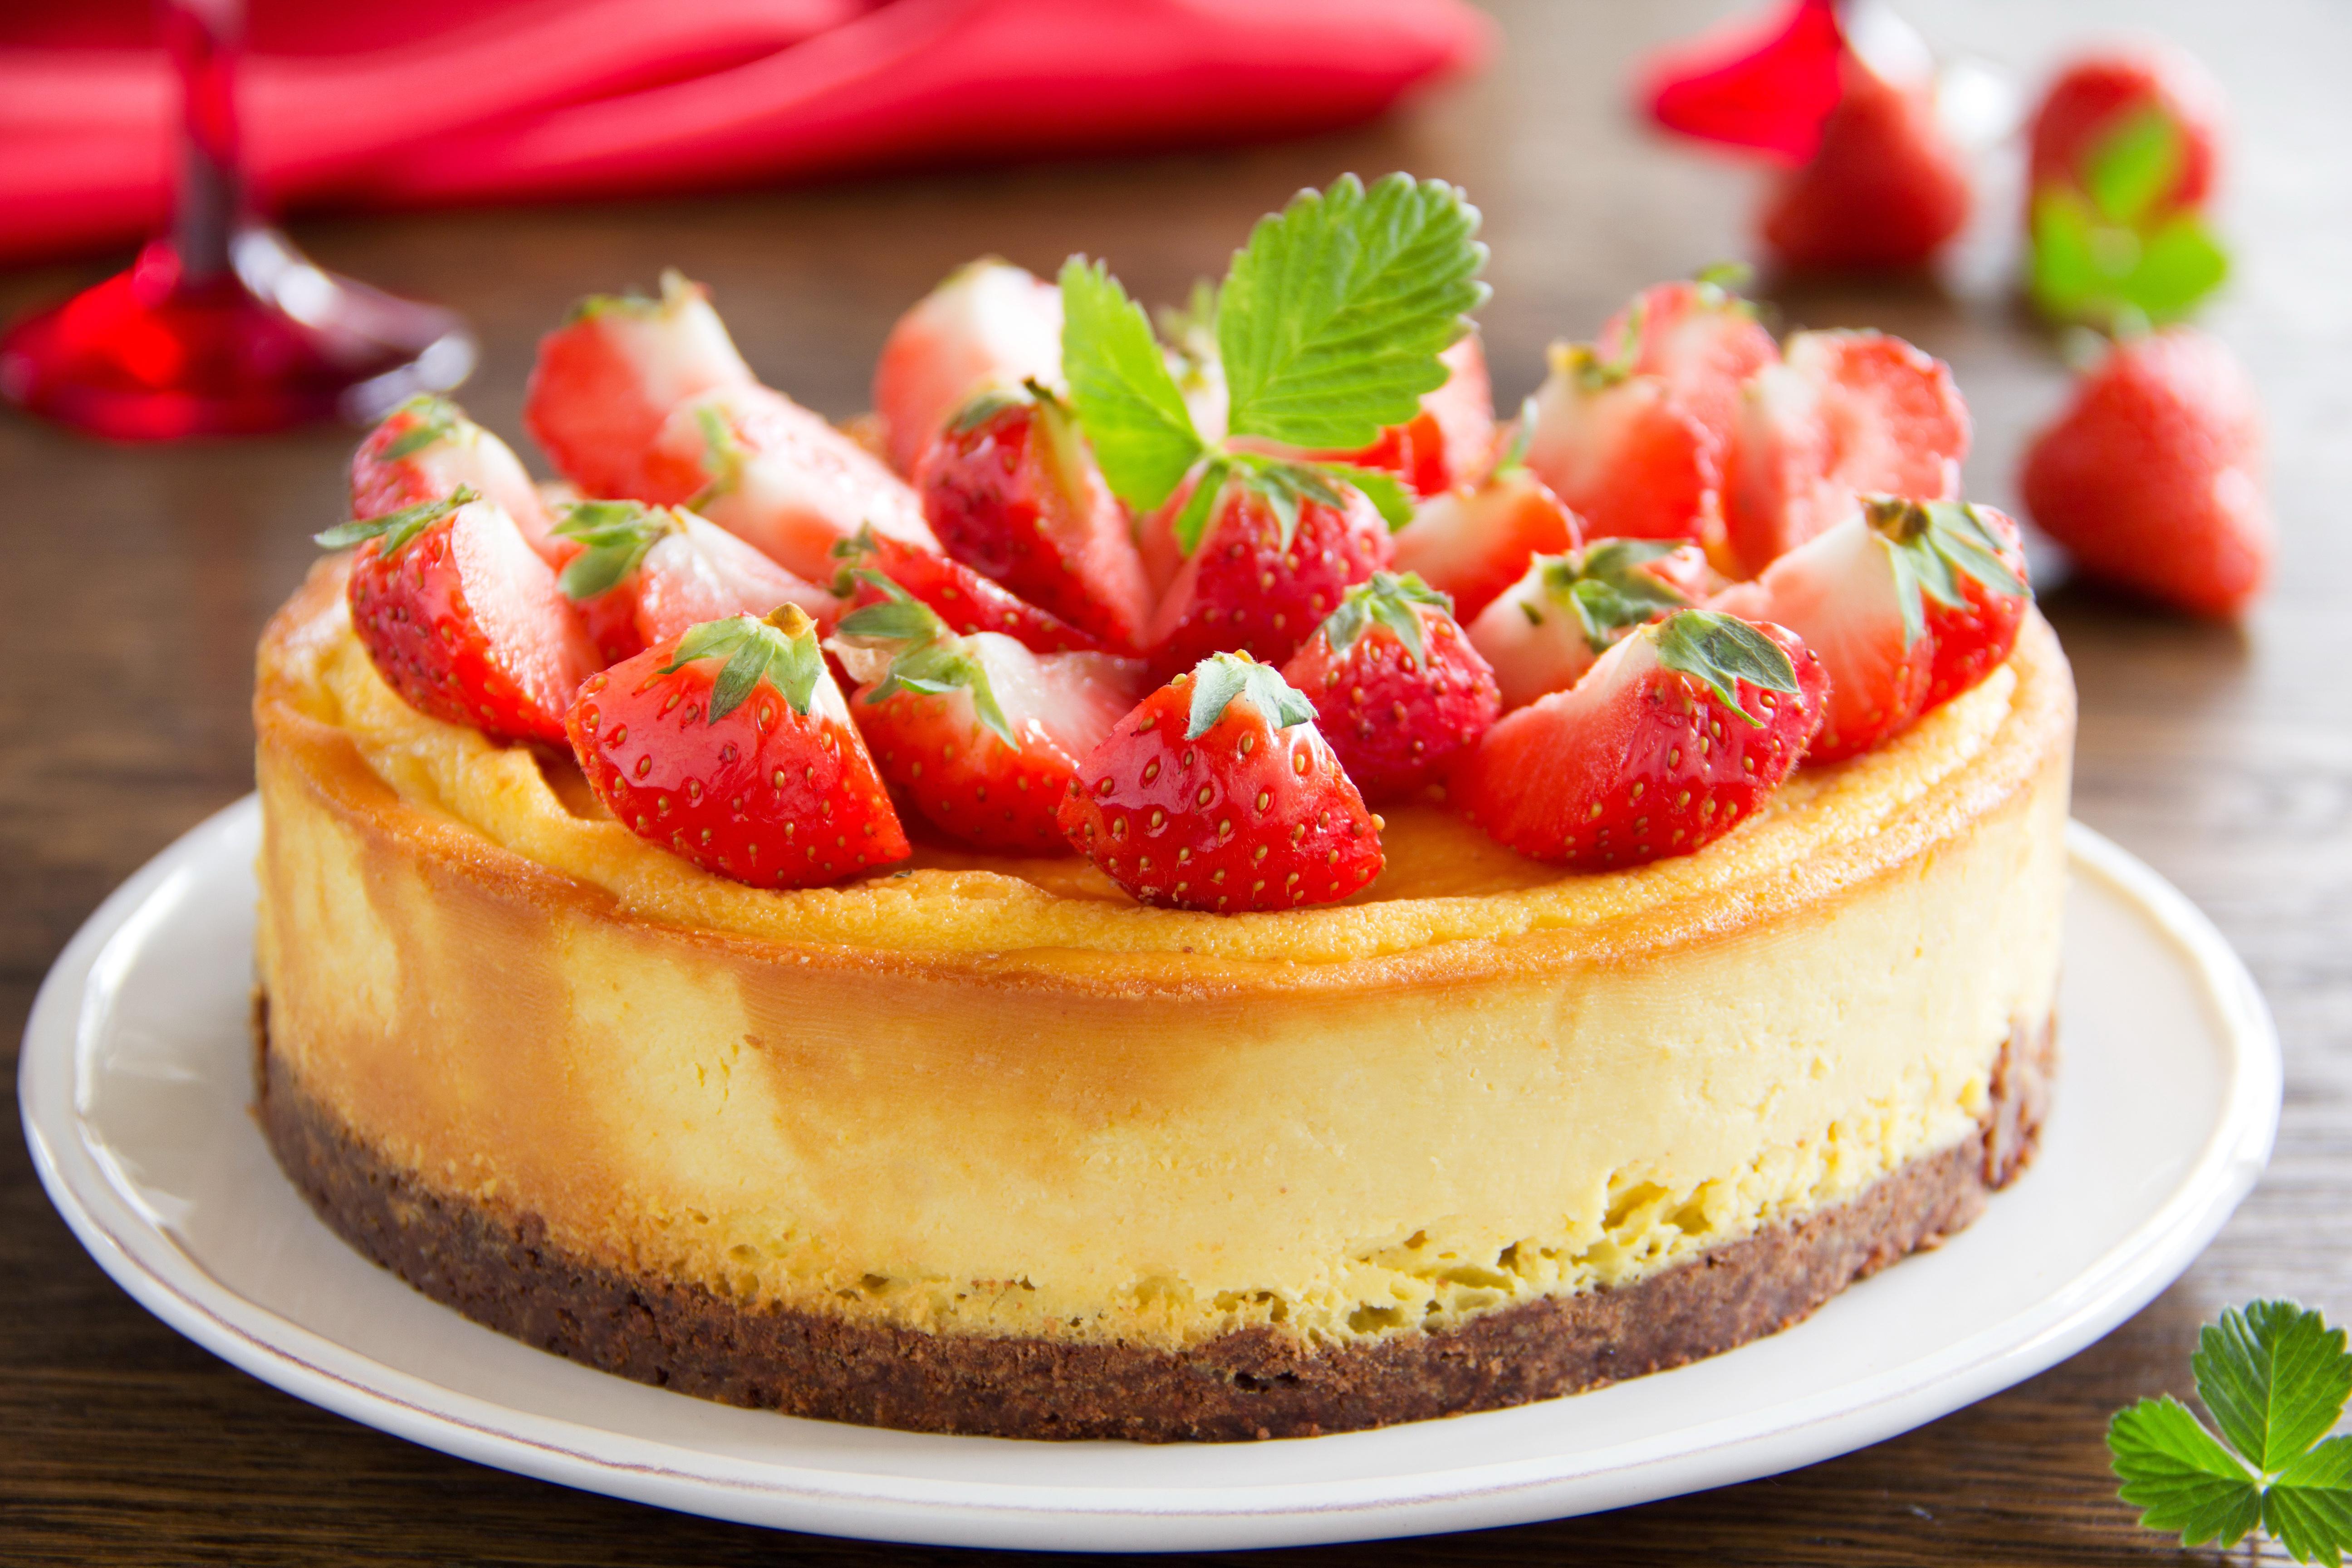 торт пирог  № 1406604 бесплатно